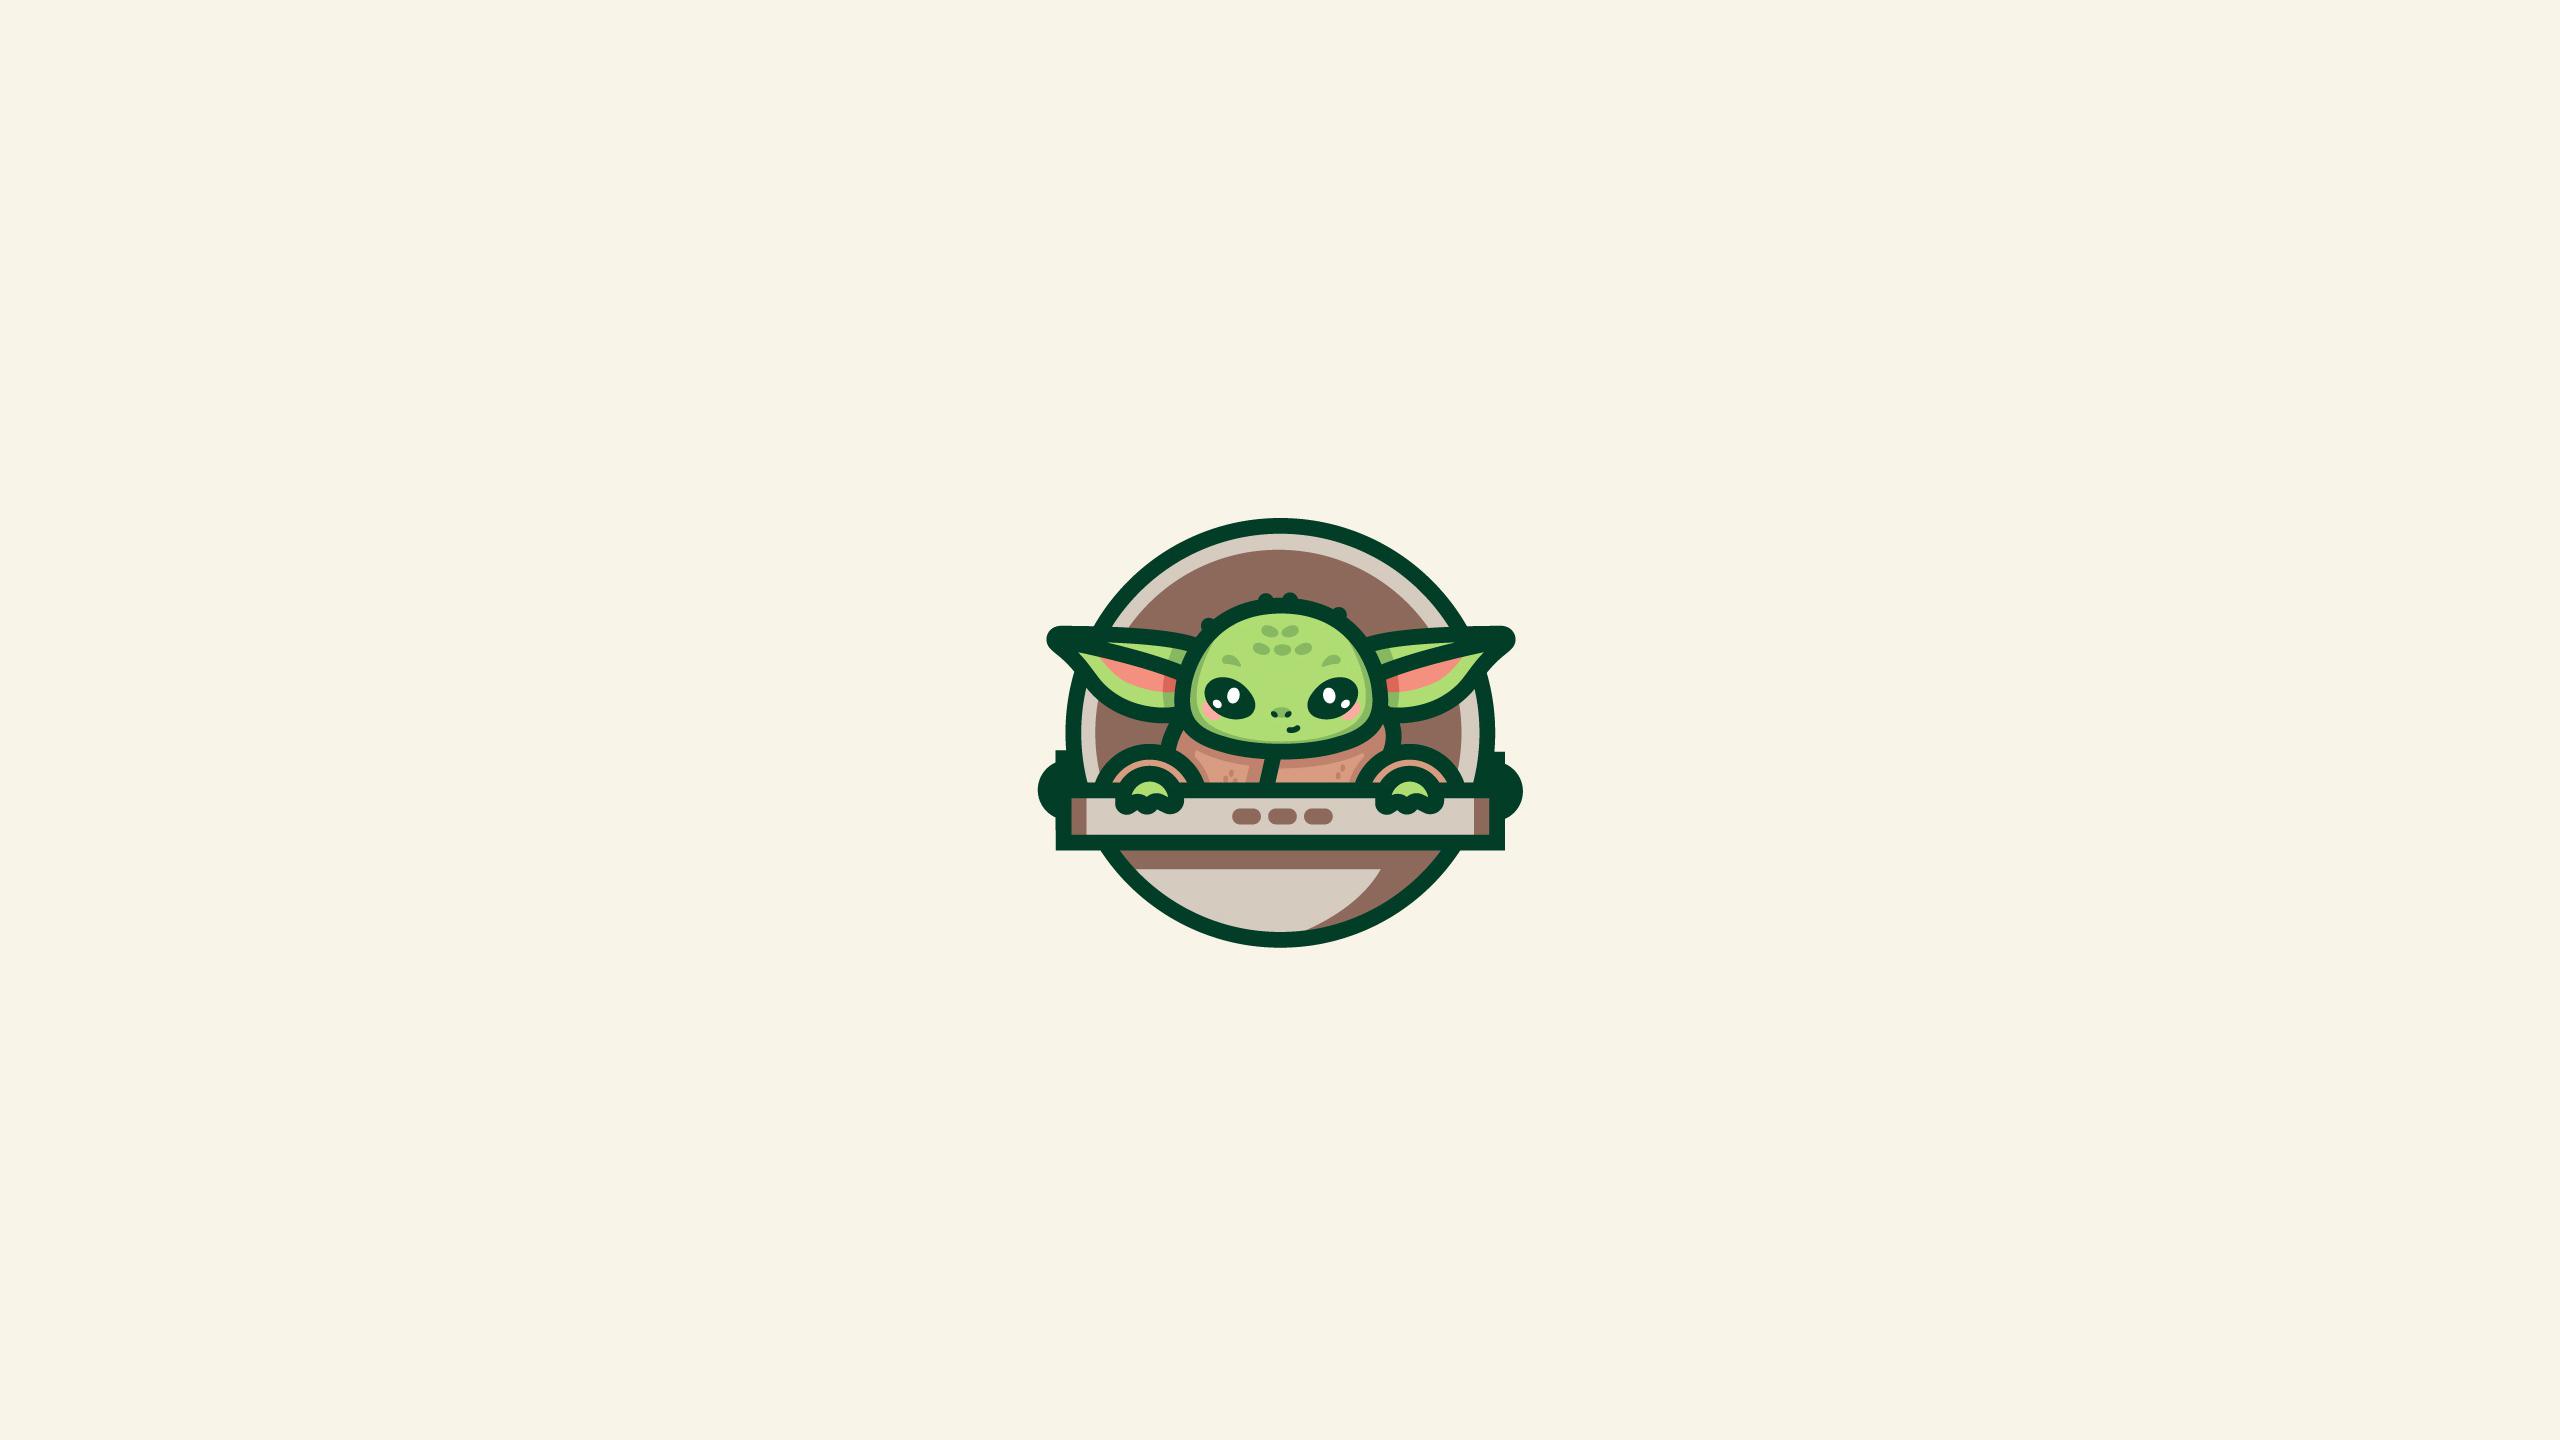 Wallpaper Baby Yoda Star Wars Illustration Digital 2560x1440 Kg7x 1744645 Hd Wallpapers Wallhere